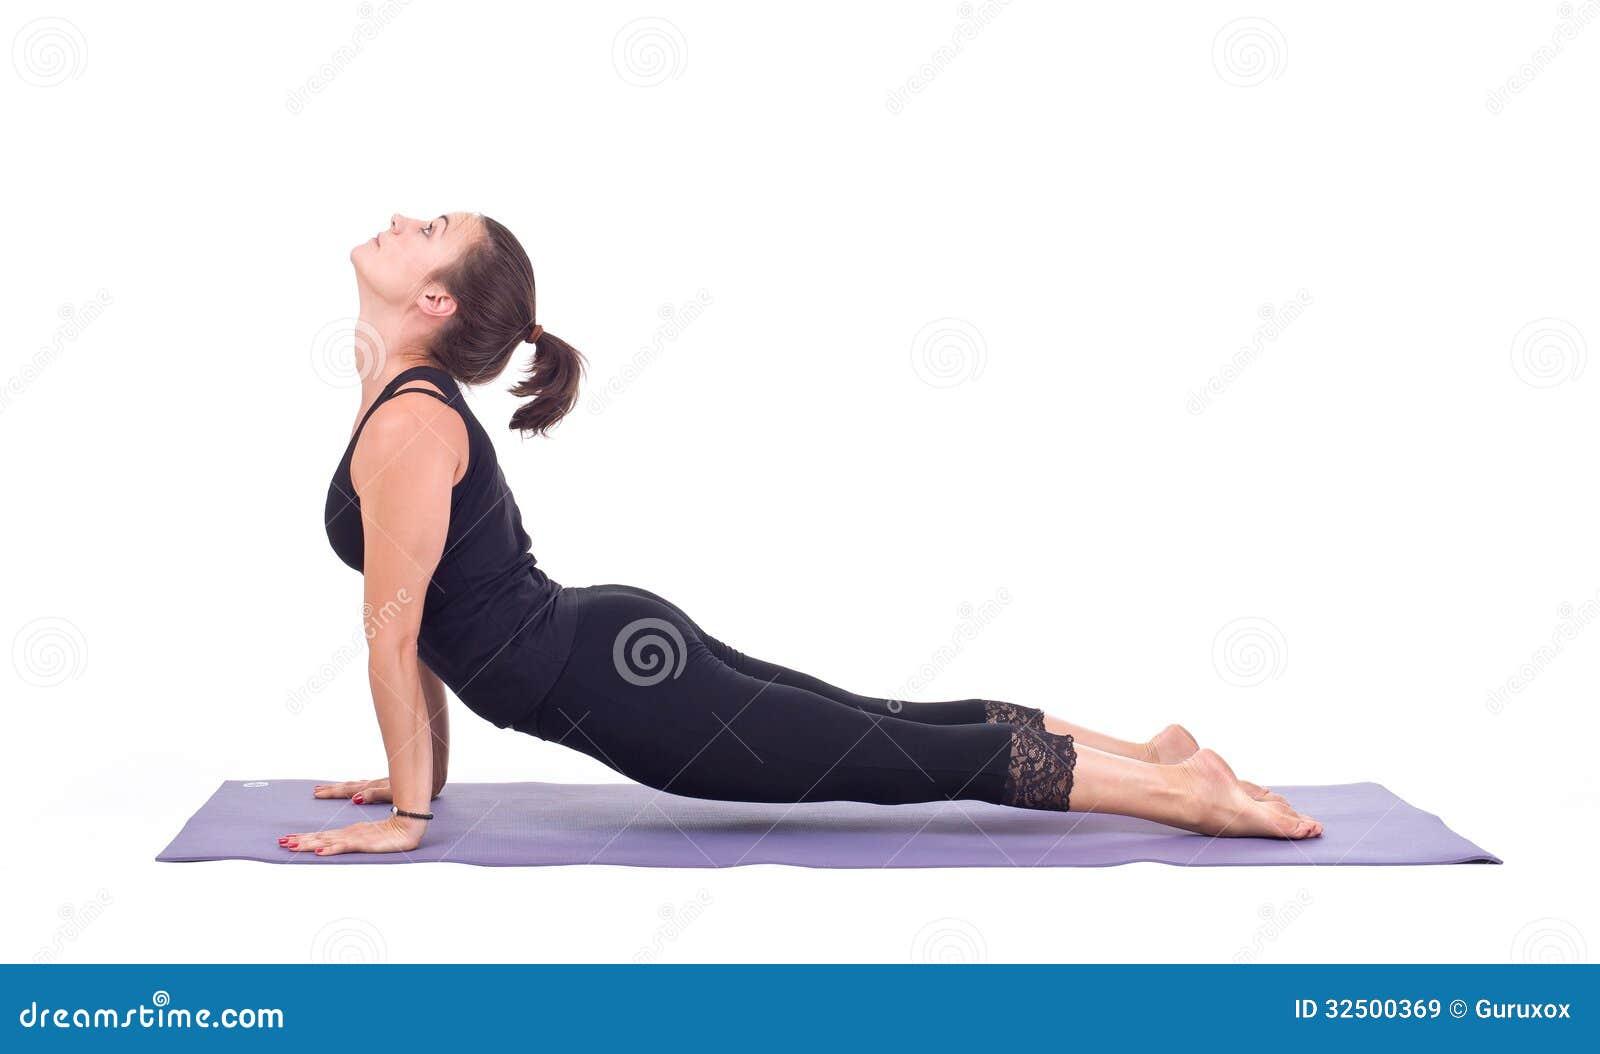 hot yoga studio business plan